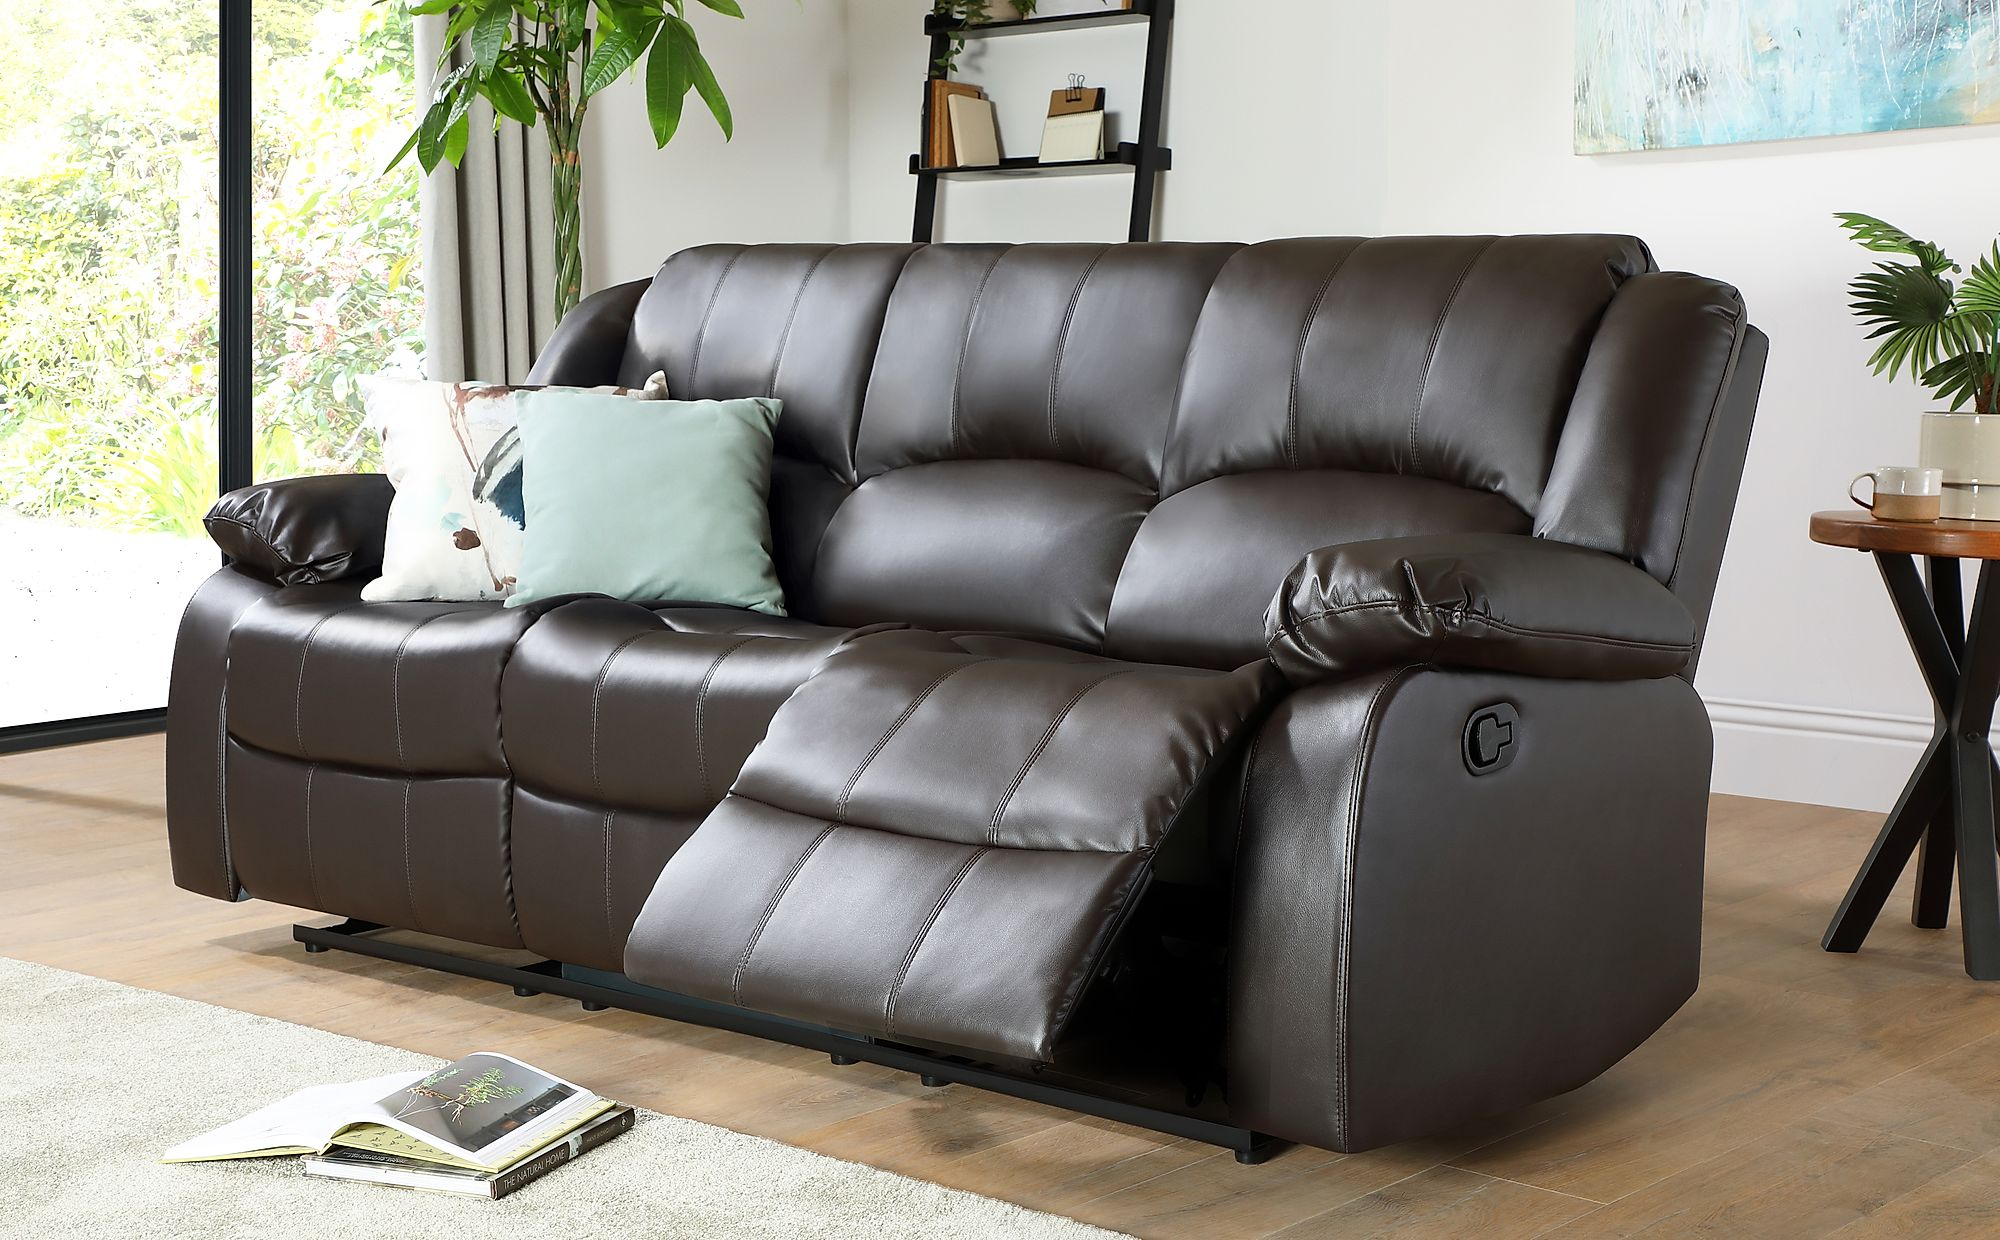 Dakota Brown Leather Recliner Sofa 3 Seater